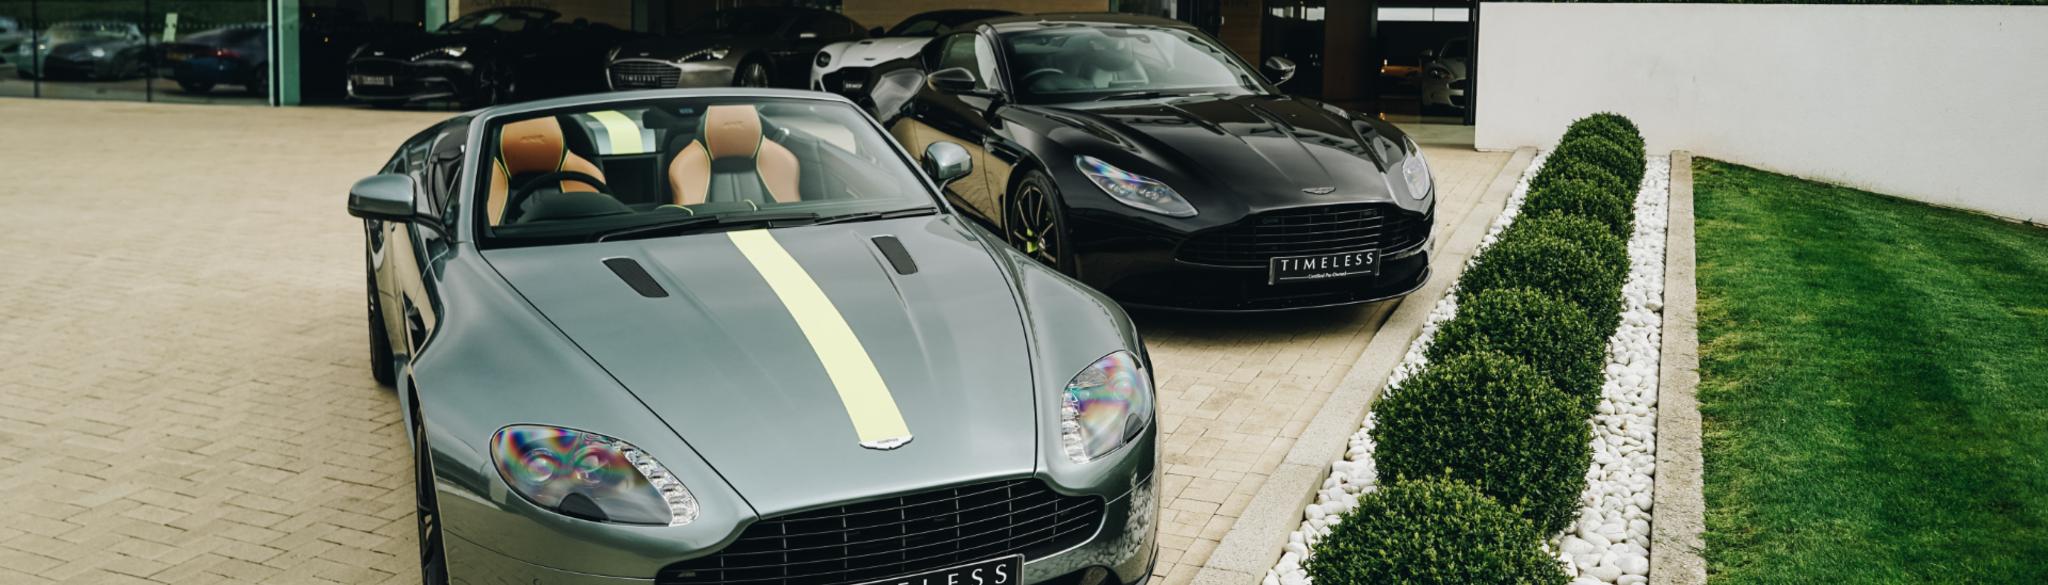 Aston Martin AMR Range